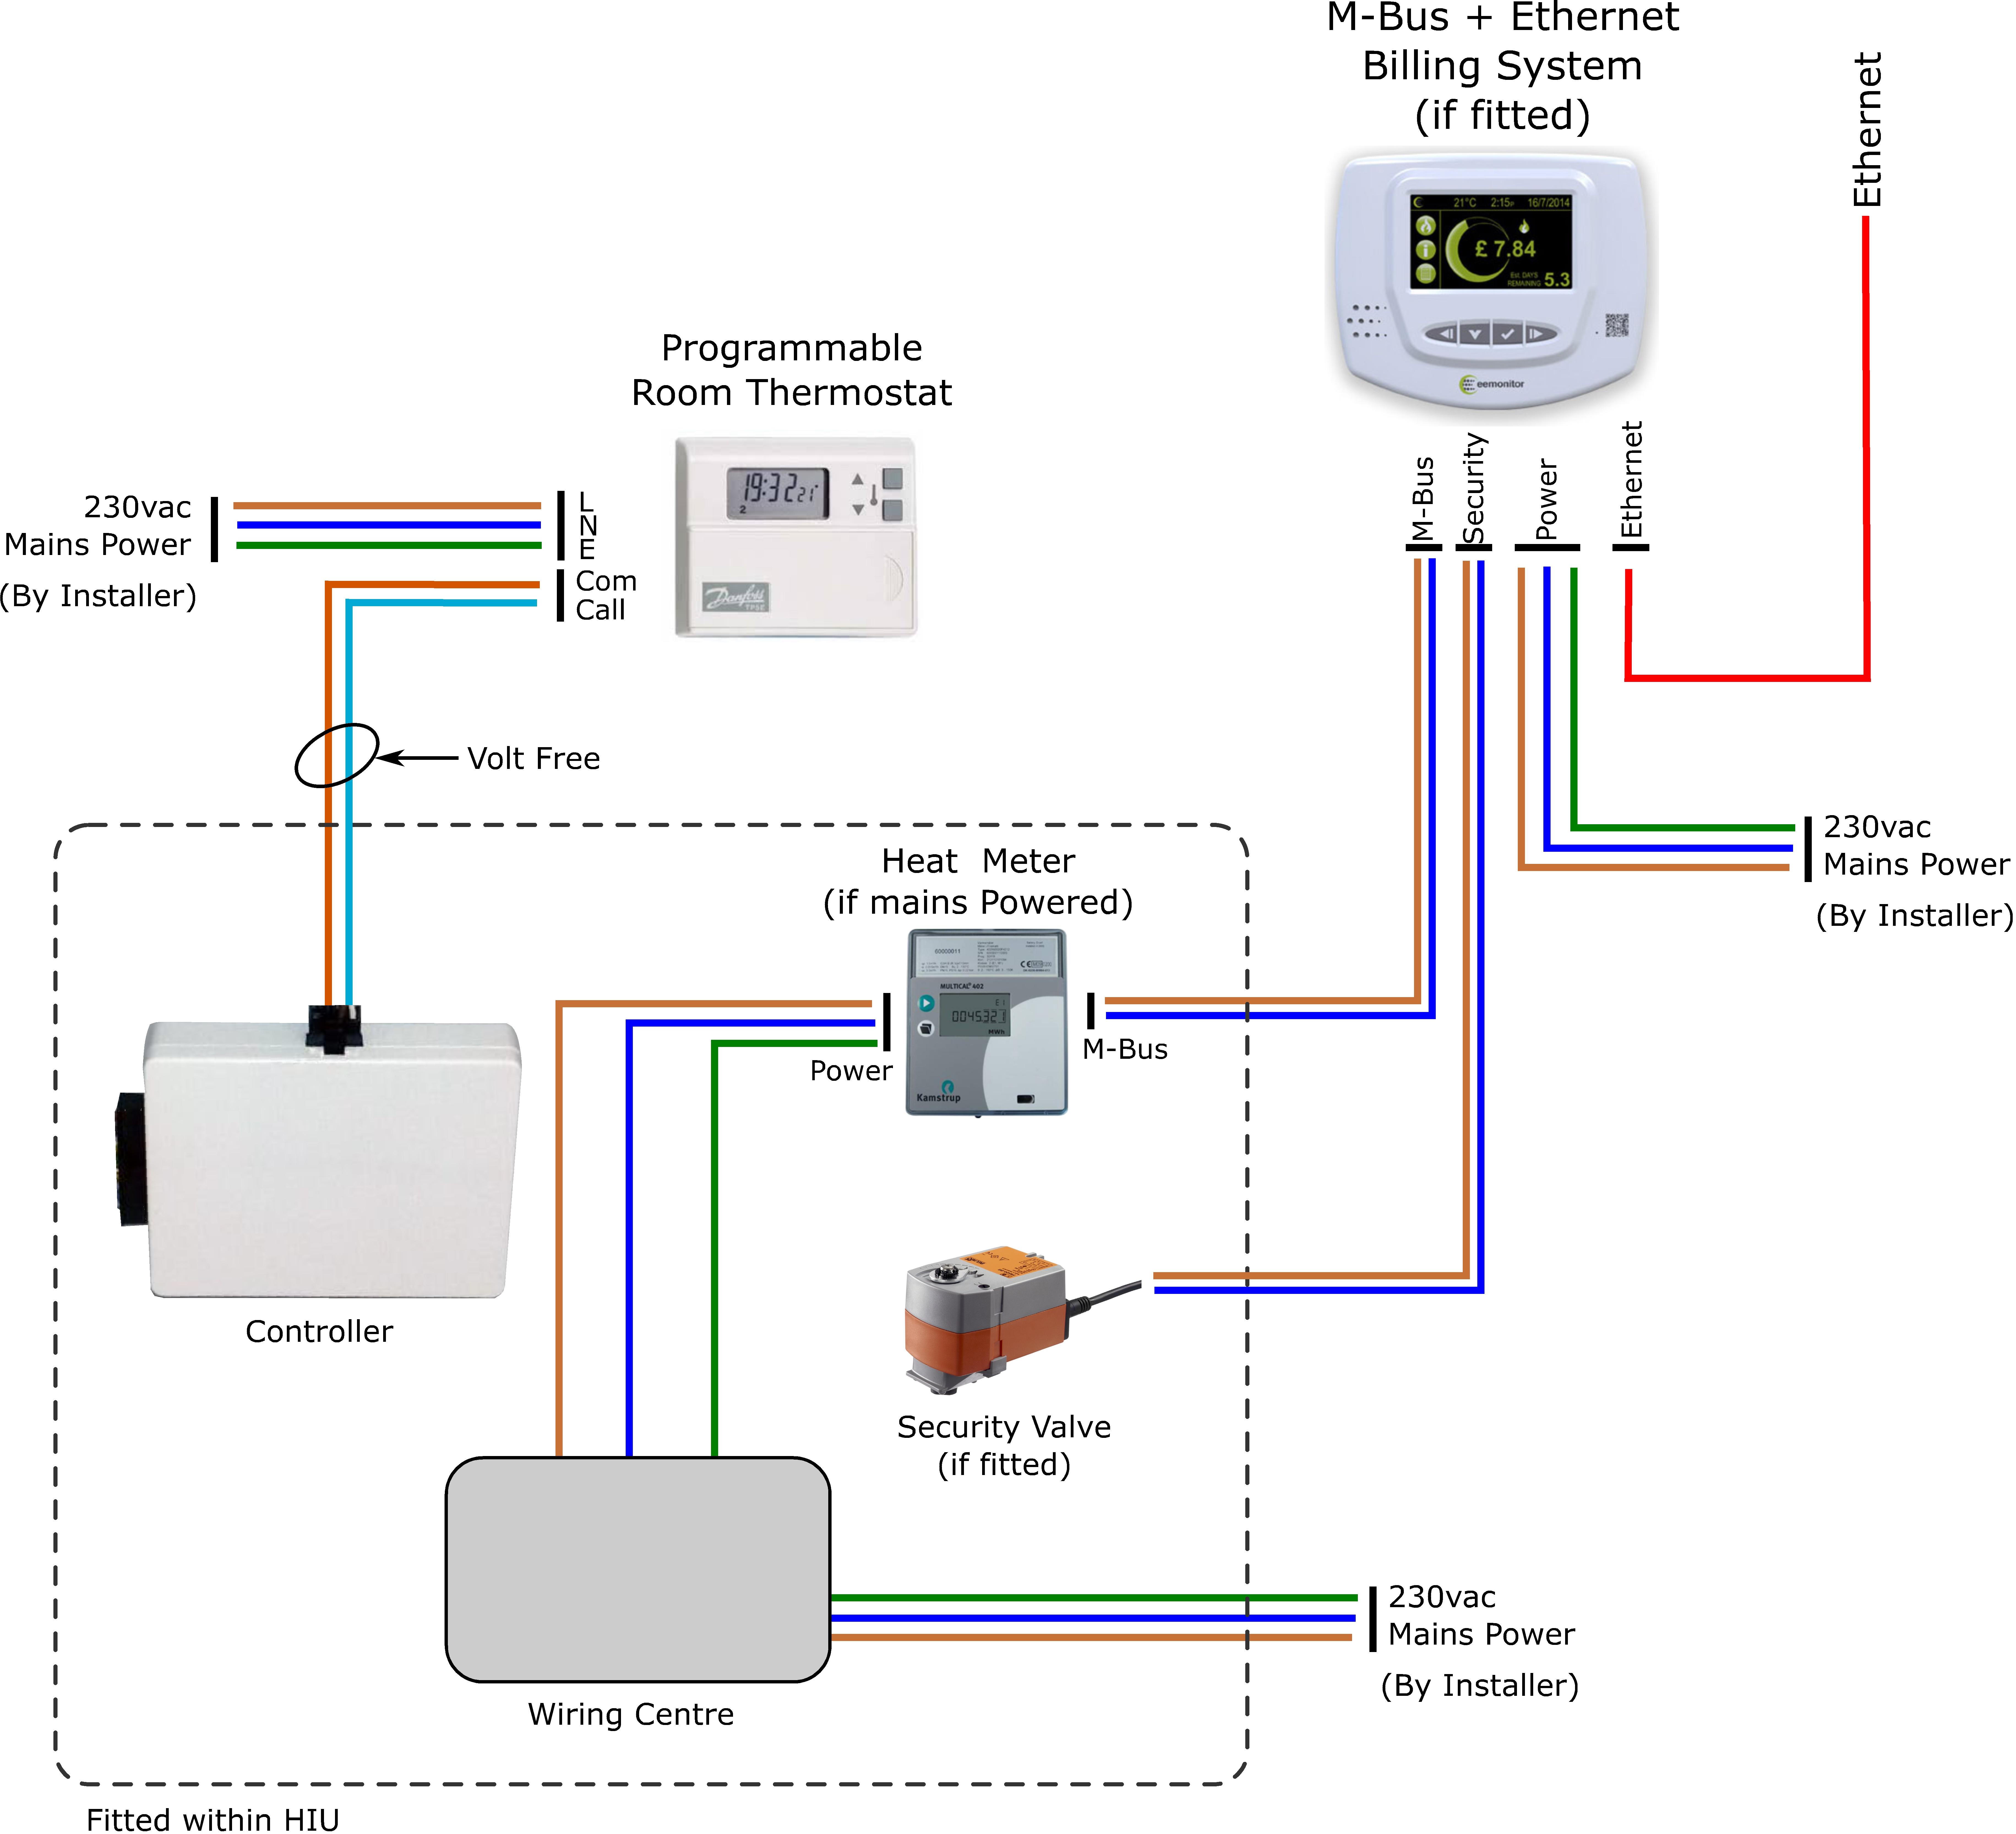 Single Phase Kwh Meter Circuit Diagram Wiring Master Blogs Watt Hour Economy 7 And Schematics Power Smart